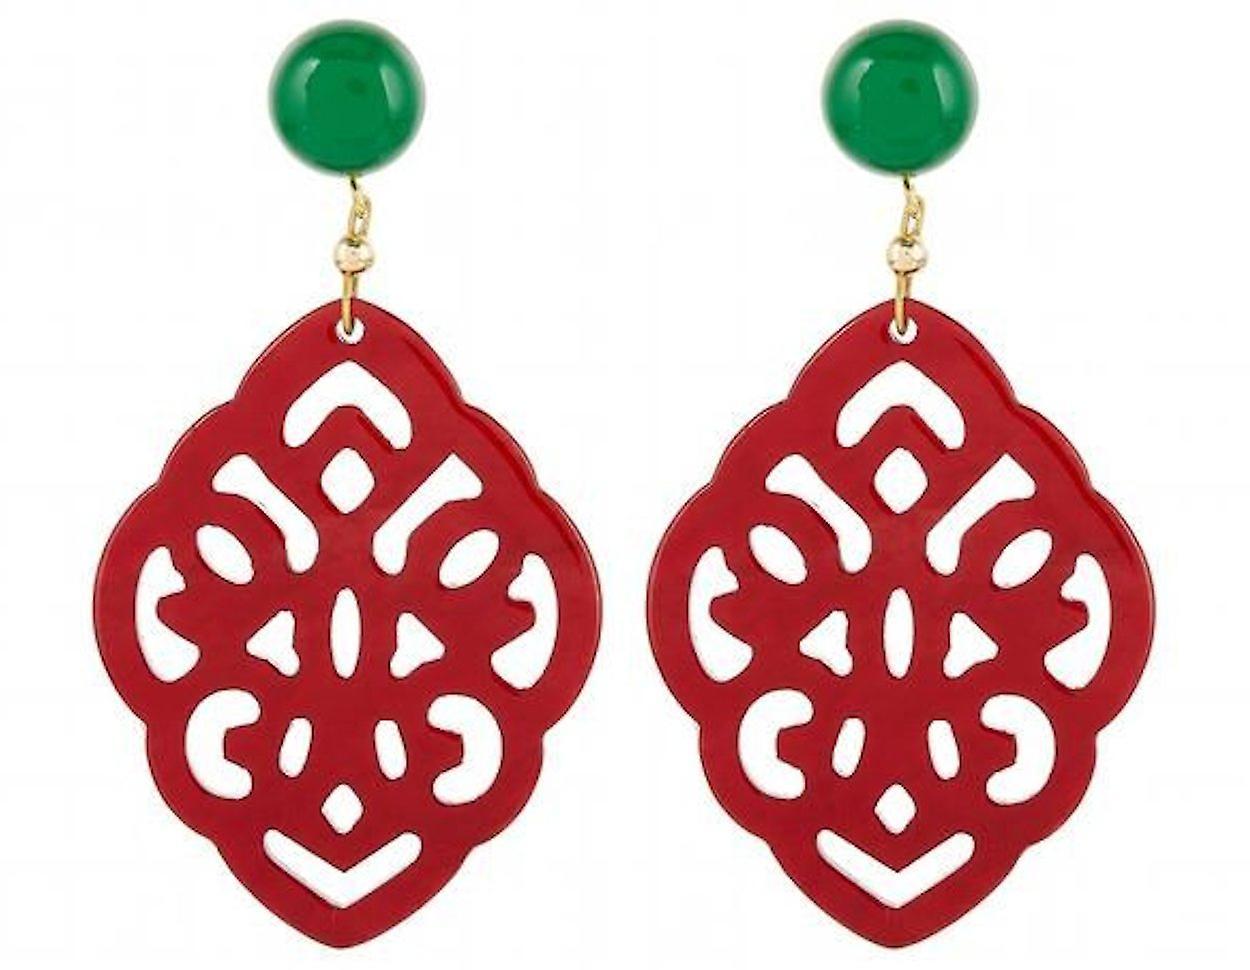 Gemshine Ohrringe grüne Chalcedoen, Schildpatt Harz Tropfen 925 Silber Vergoldet